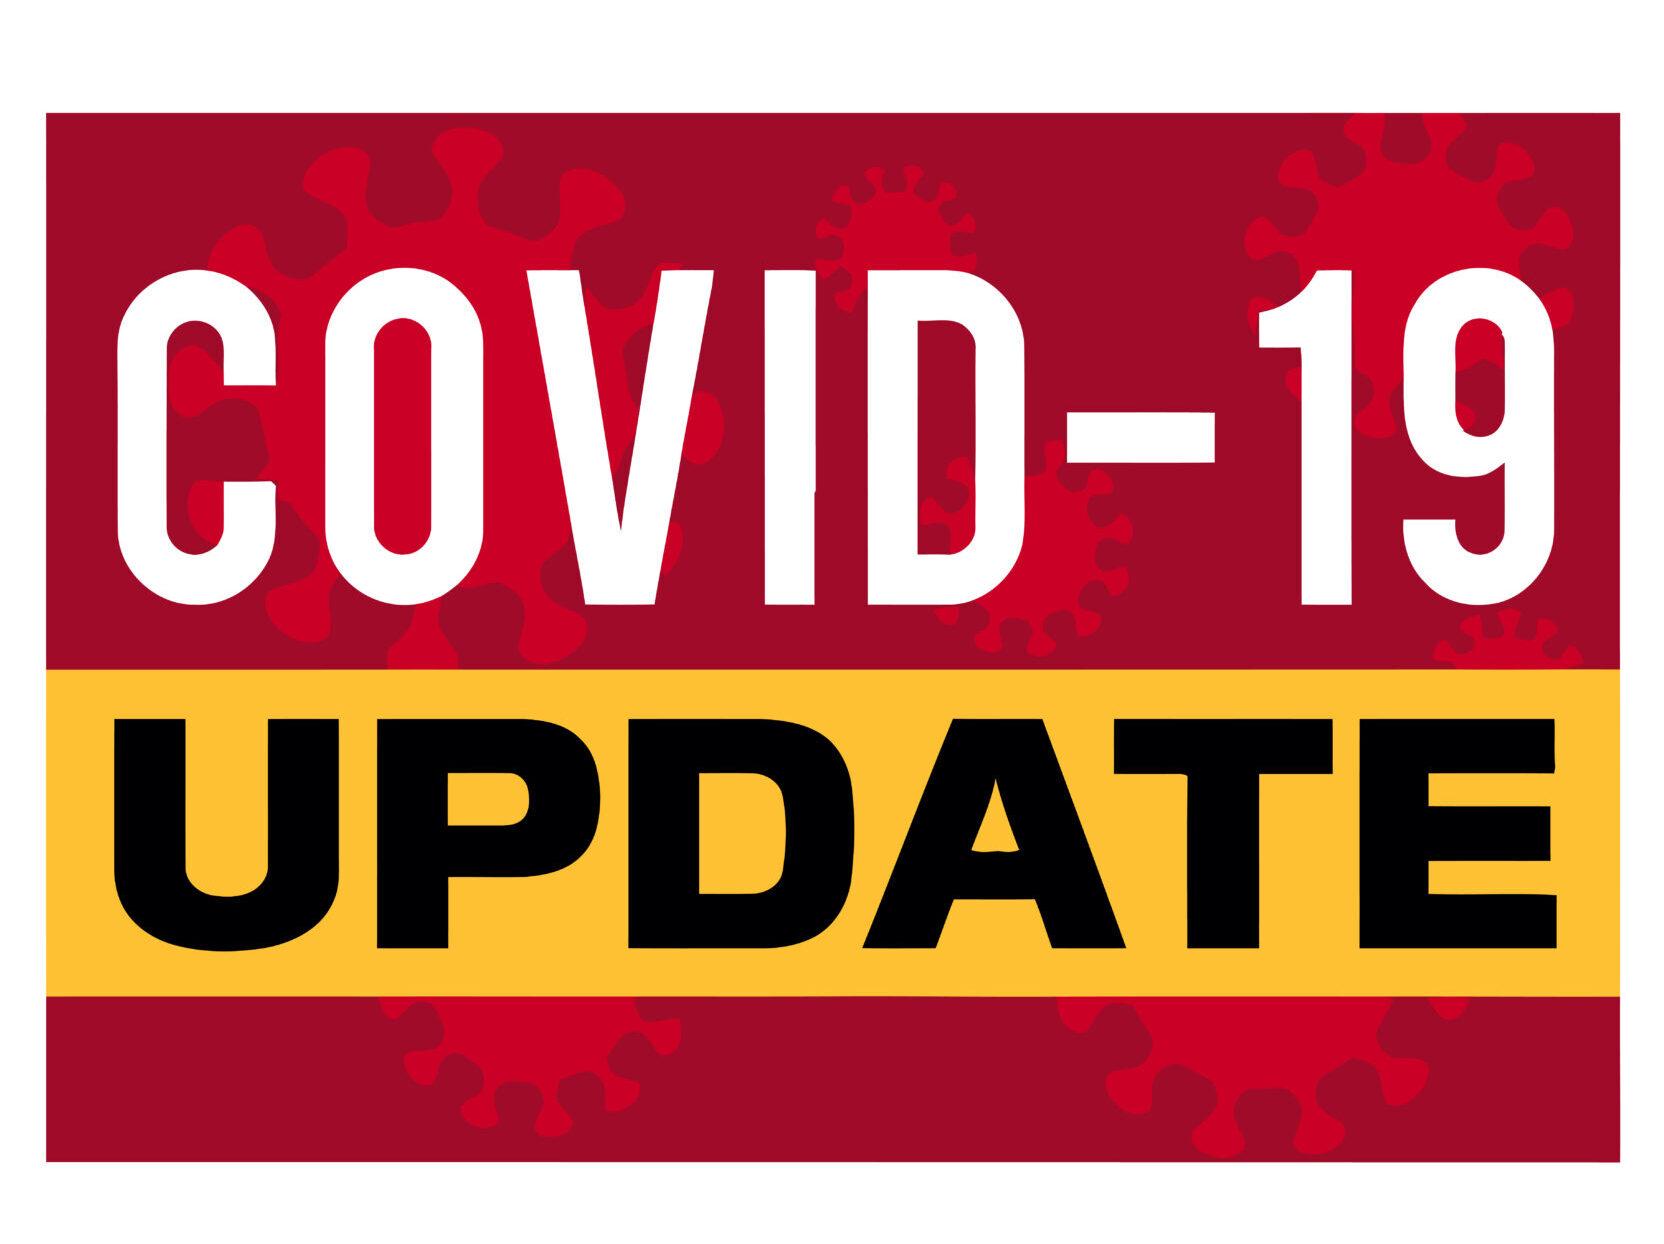 Covid-19 Update February 2021